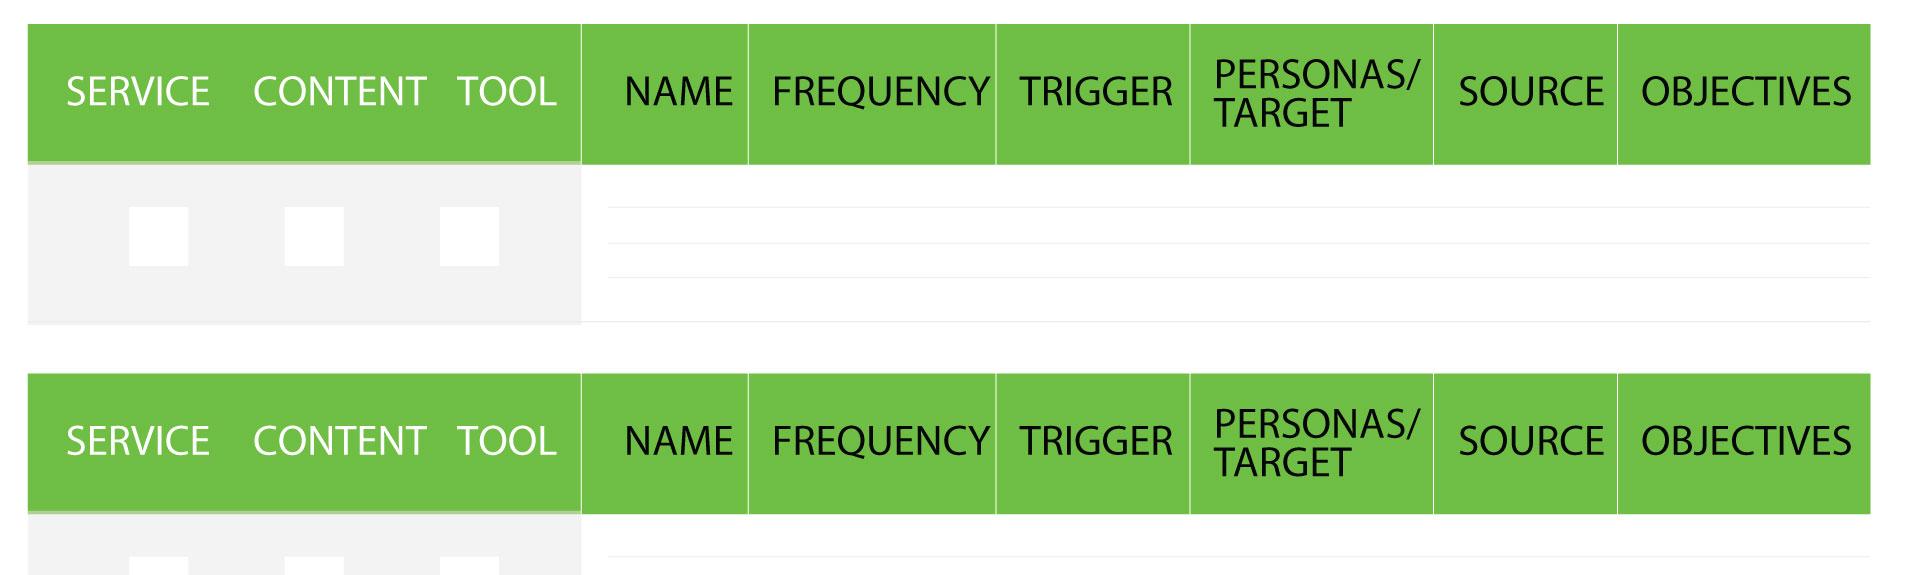 Content-service-tool (CST) Grid